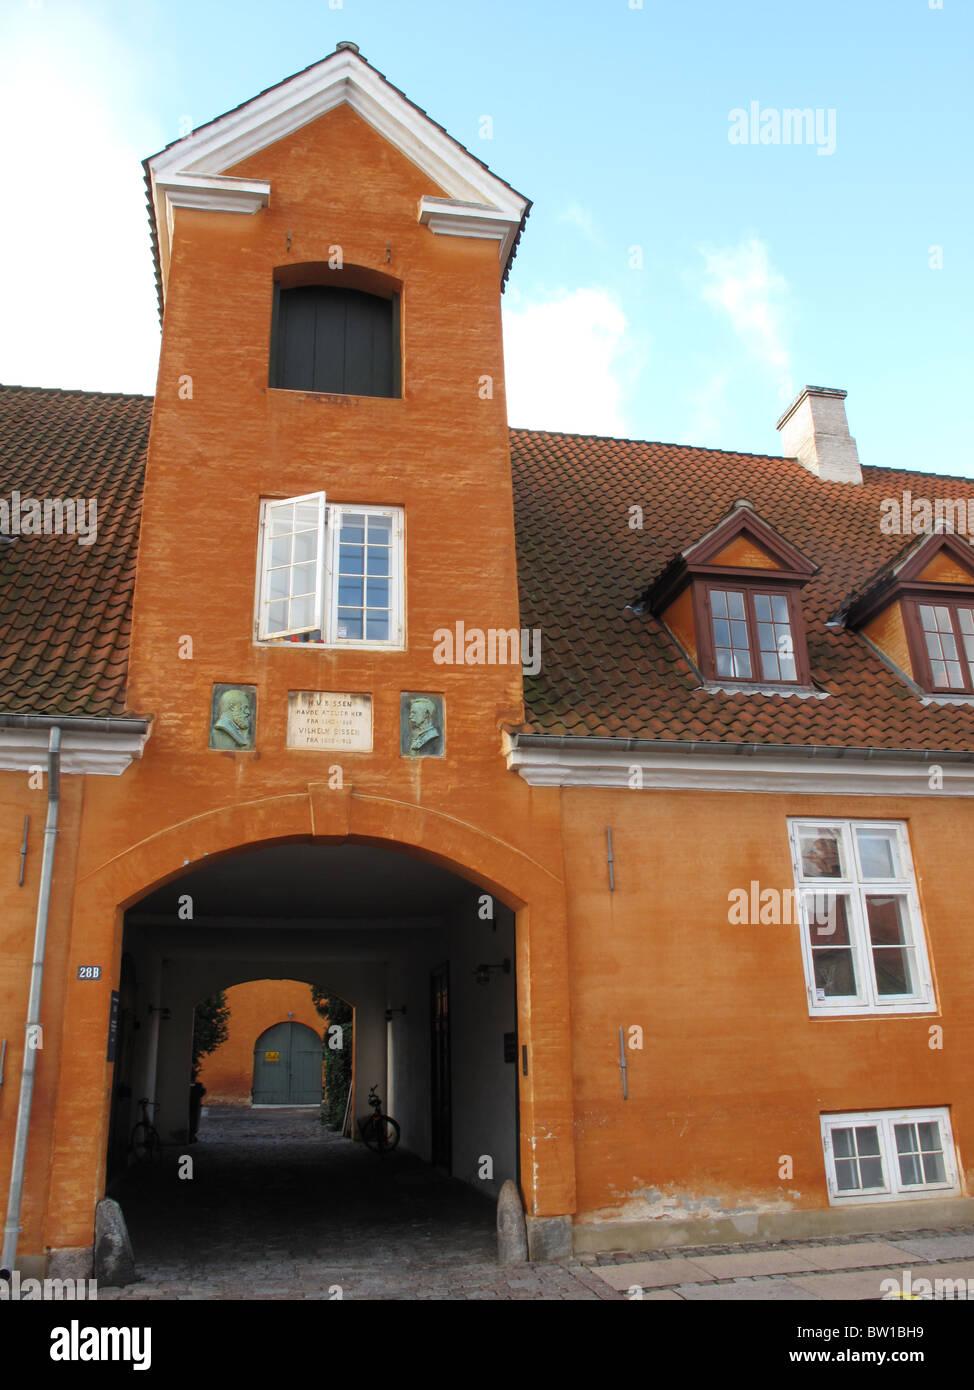 Yellow building - Bryghusgade - Frederiksholms Kanal - Copenhagen - Denmark - Stock Image